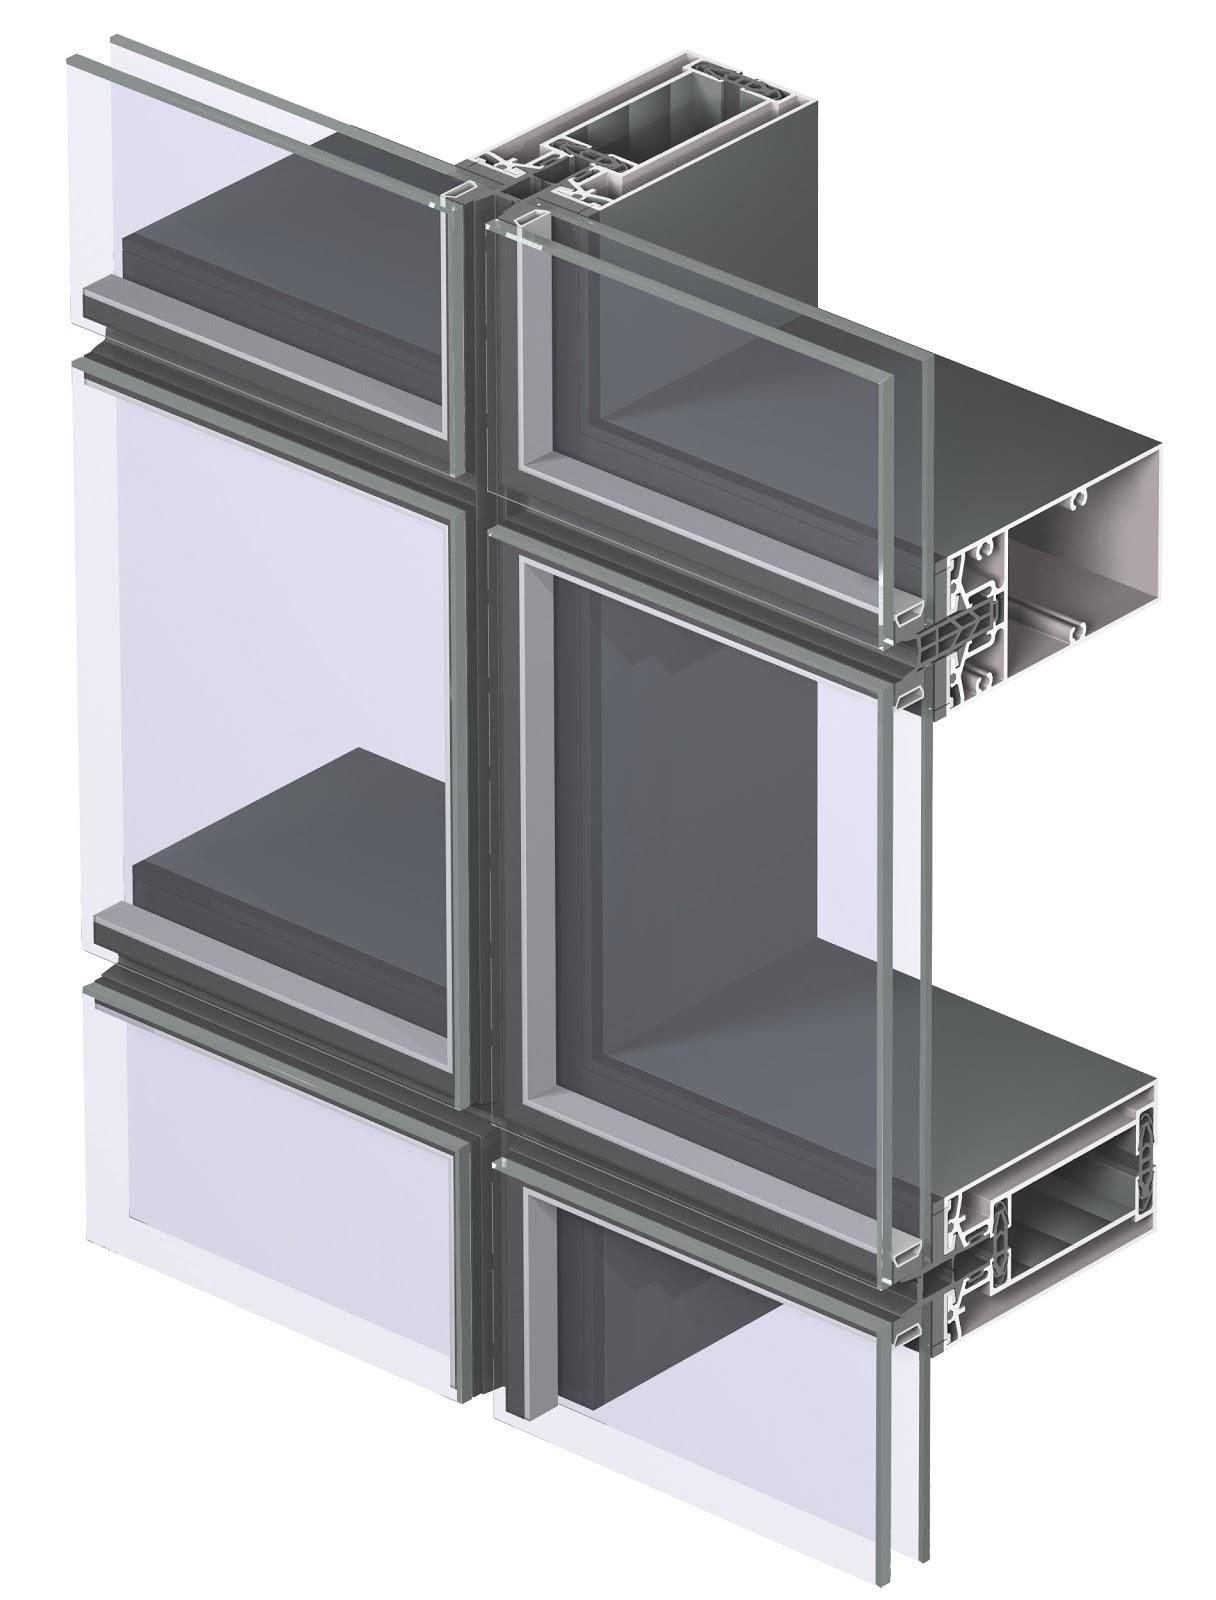 Reynaers Aluminio Y Arquitectura Fachadas Modulares Sin